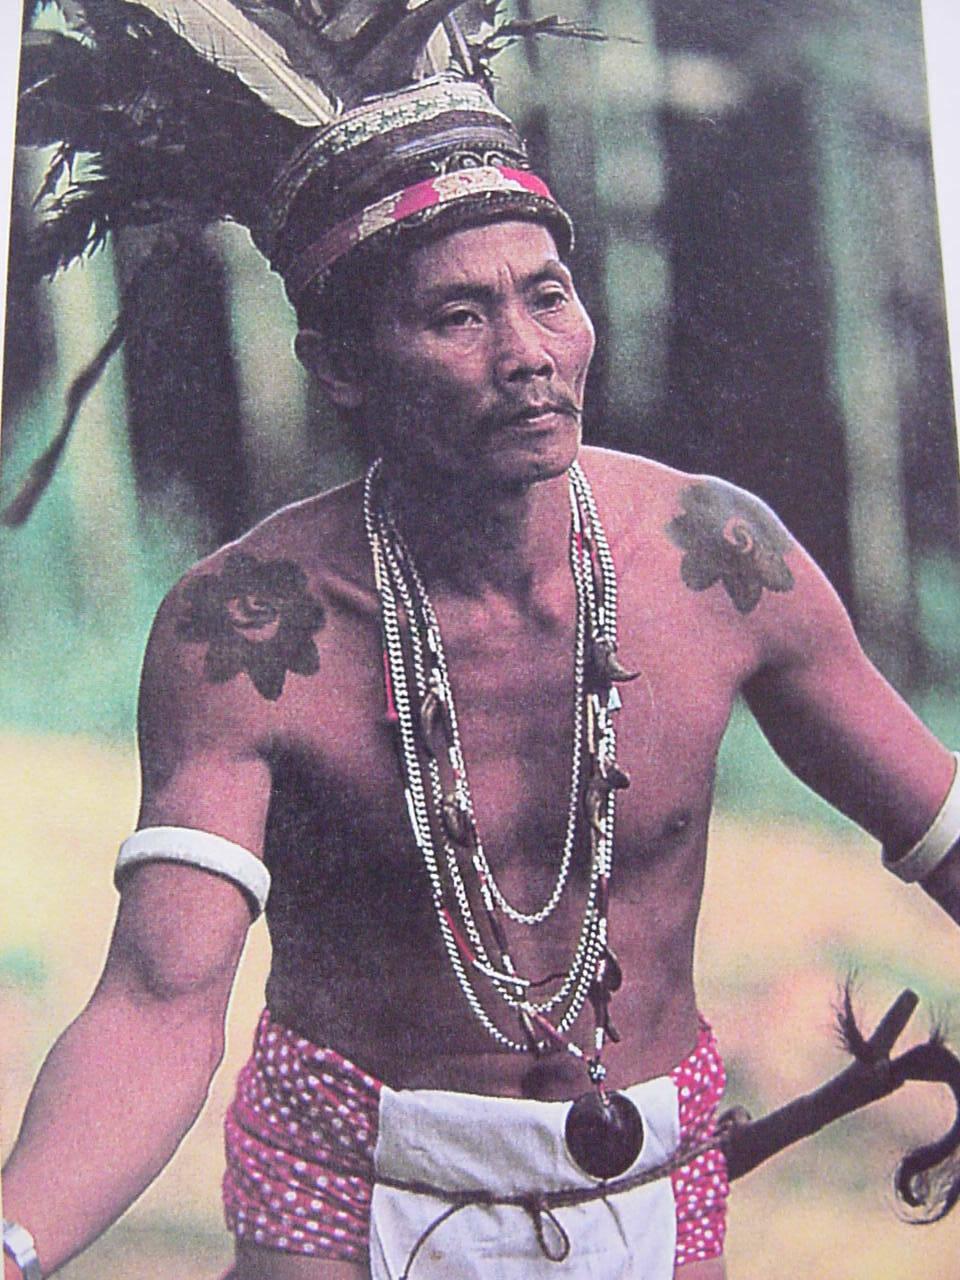 Handspun Hand woven Figural Sumba Hinggi Warp Ikat 8ft Tapestry Waeo Songket 45-